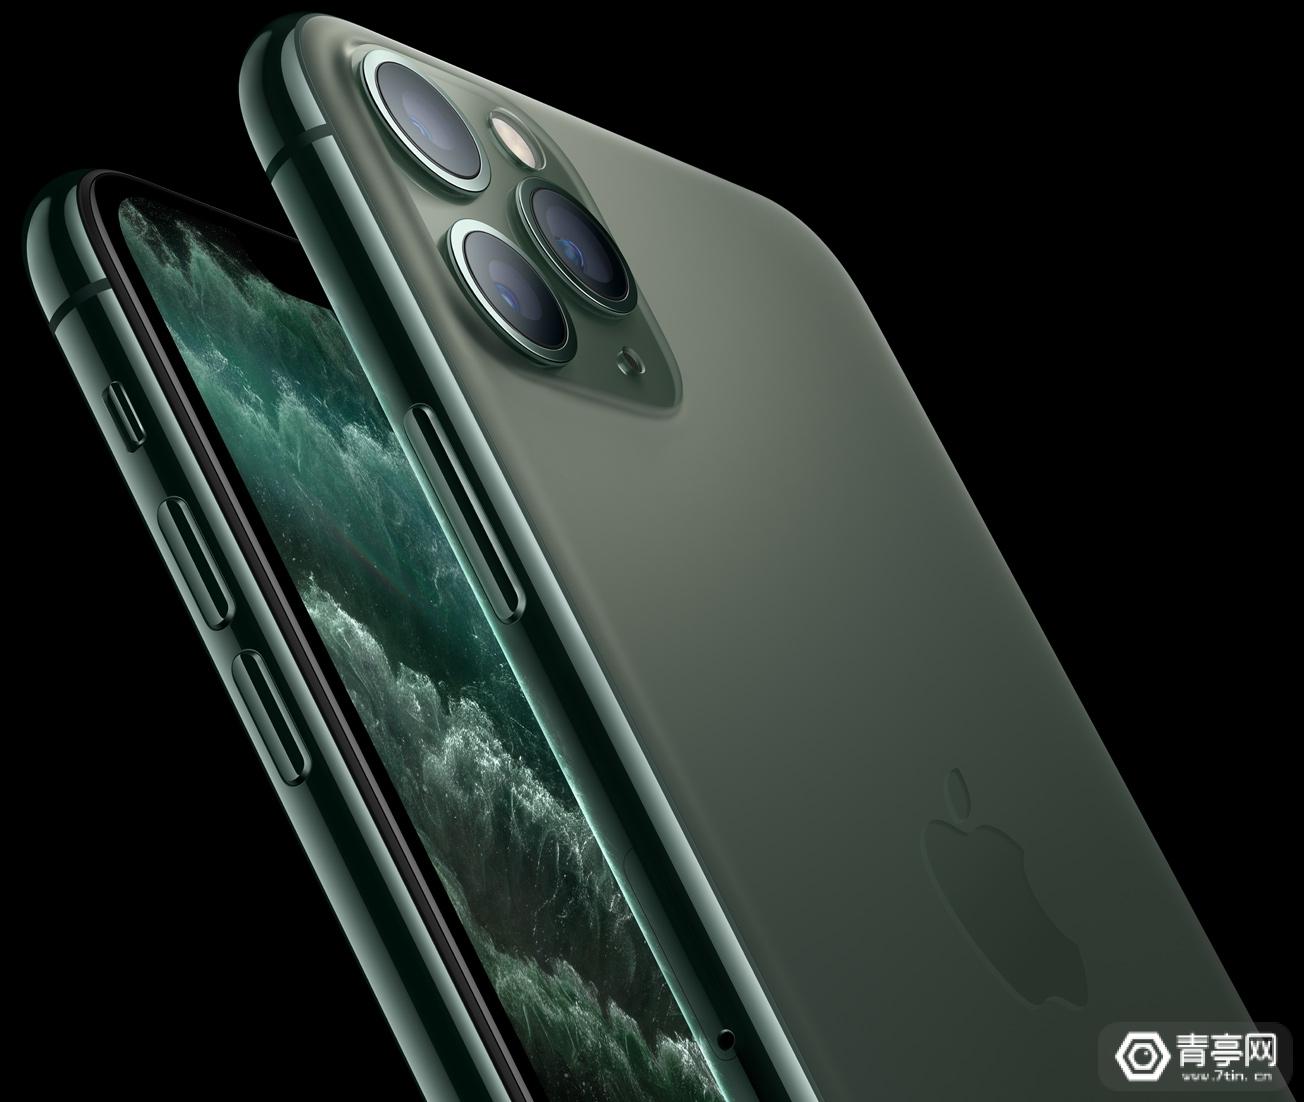 iPhone 11来了,最强拍照手机还是它